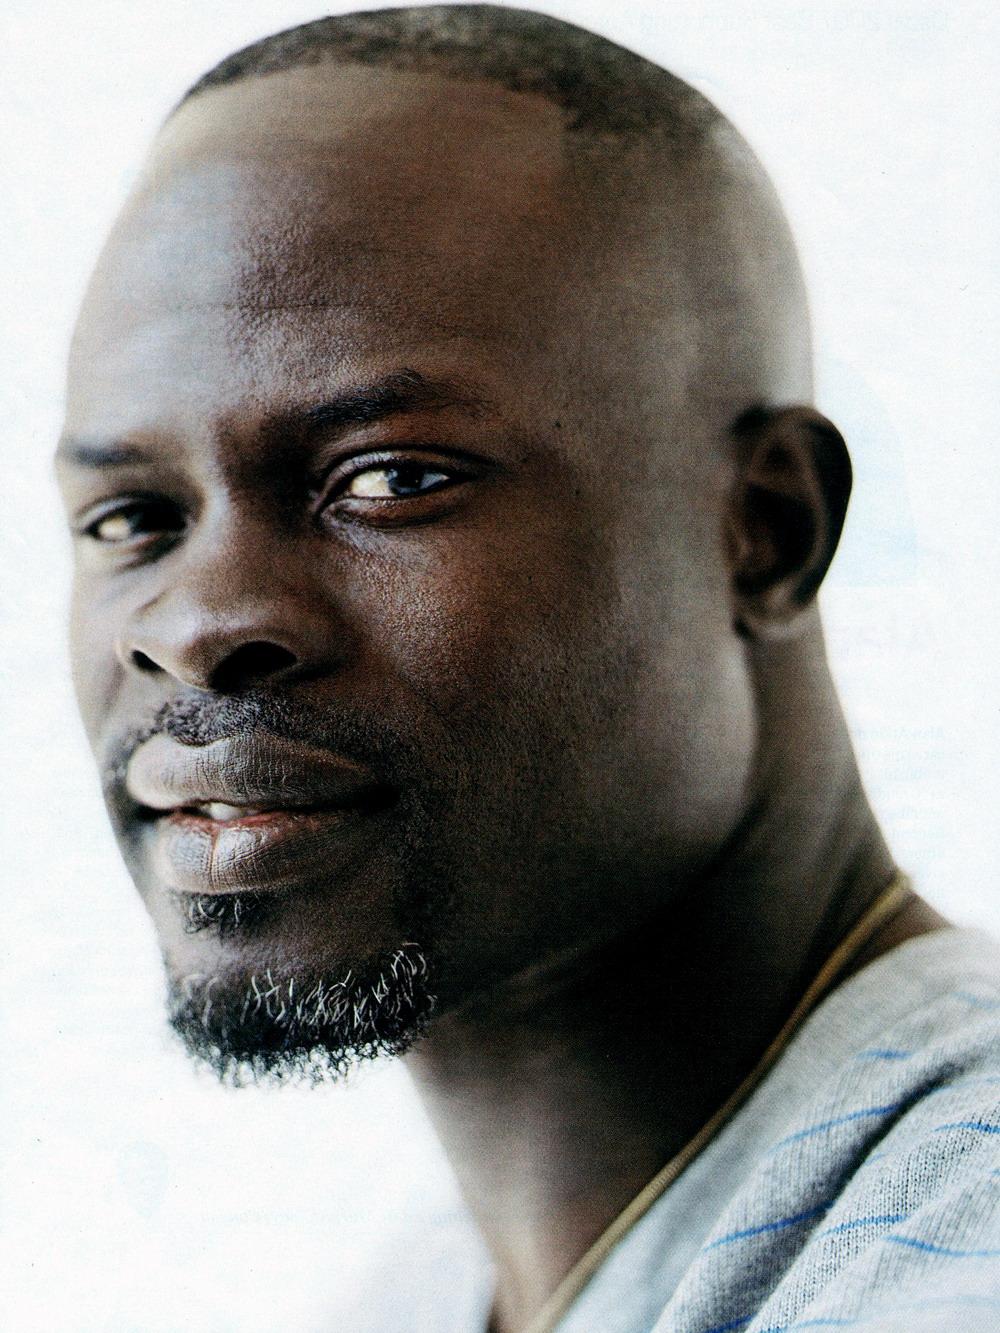 Джимон Хонсу (Djimon Hounsou)